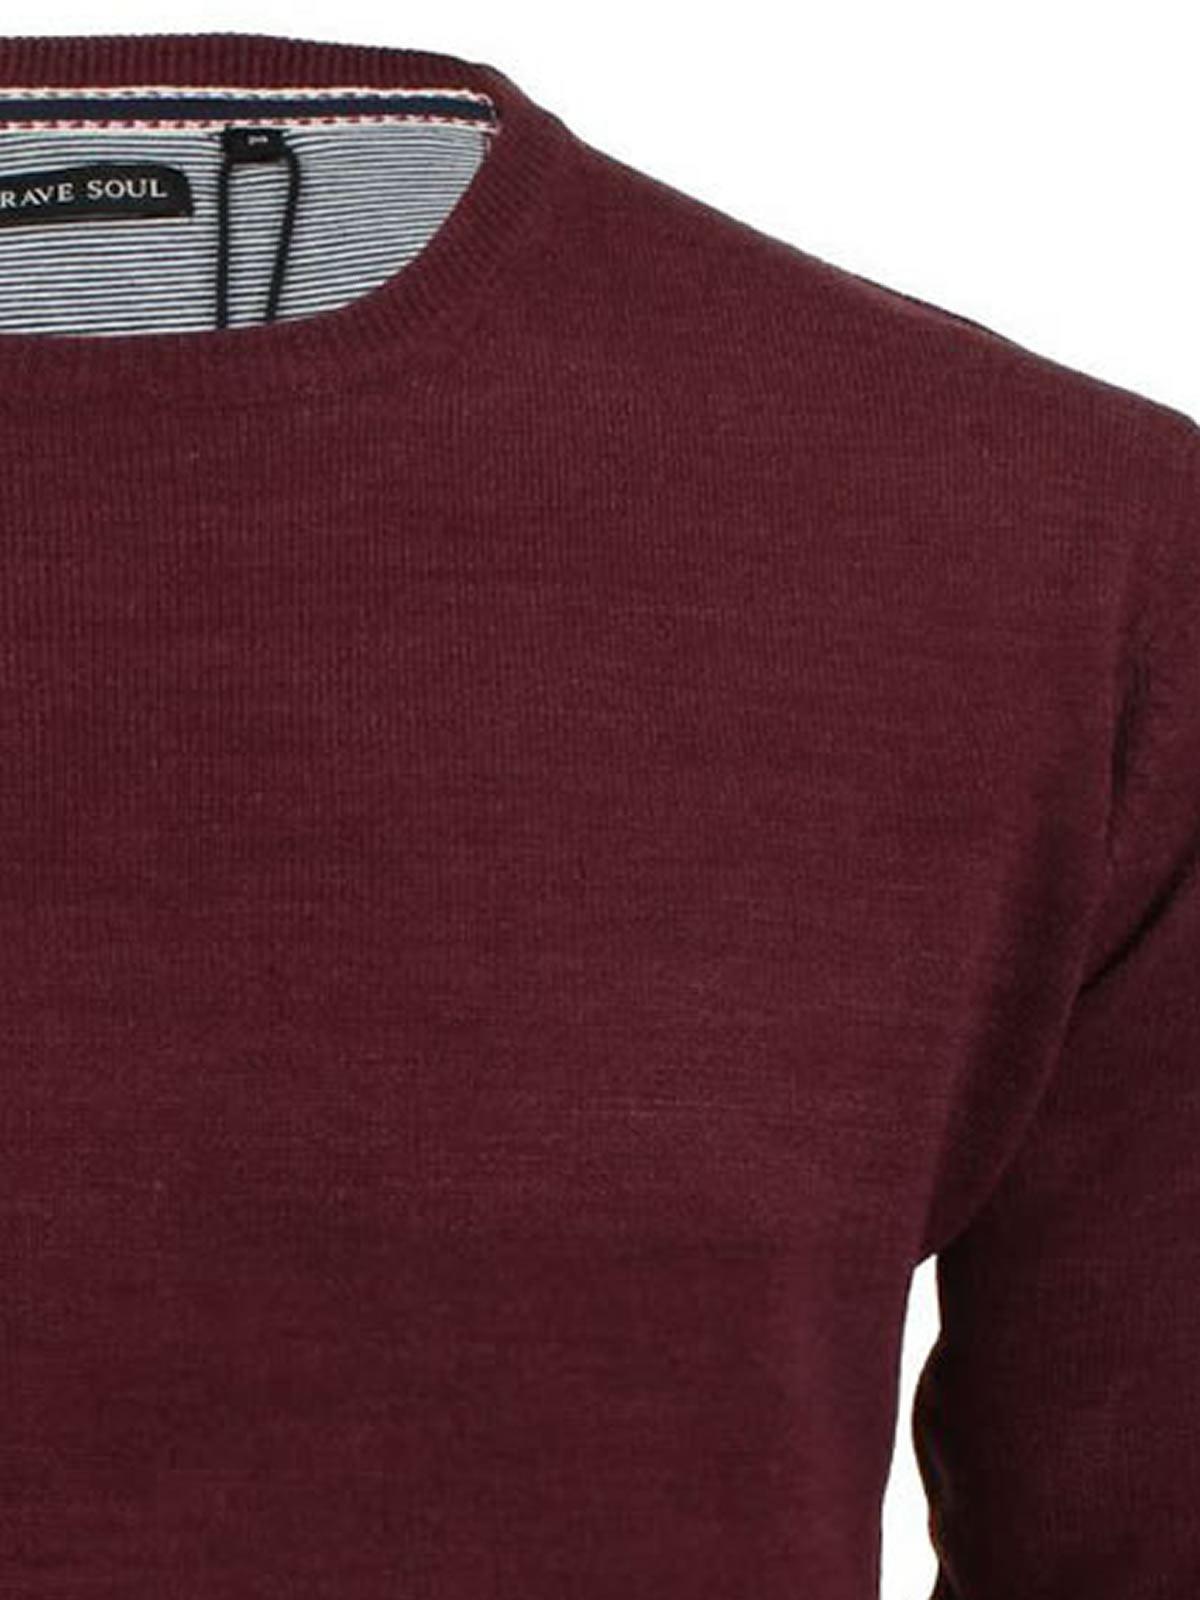 Brave-Soul-Urbain-Mens-Jumper-Knitted-Crew-Neck-Sweater thumbnail 4